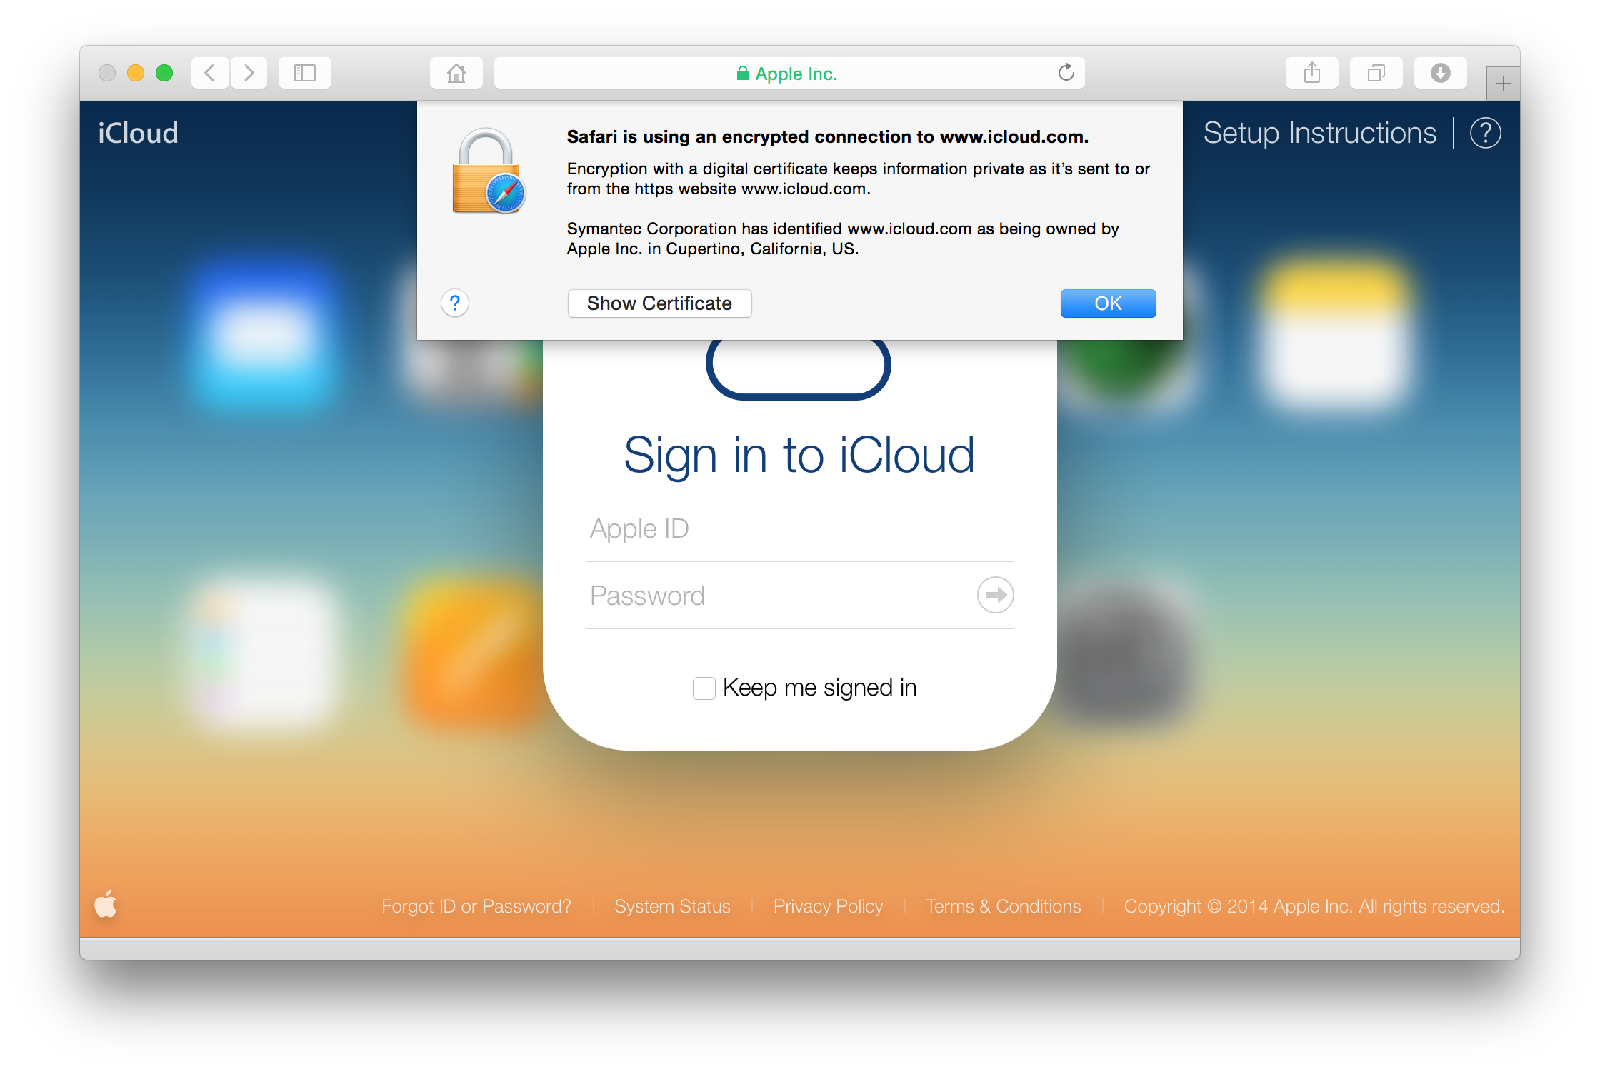 Safari (iCloud login page verified)